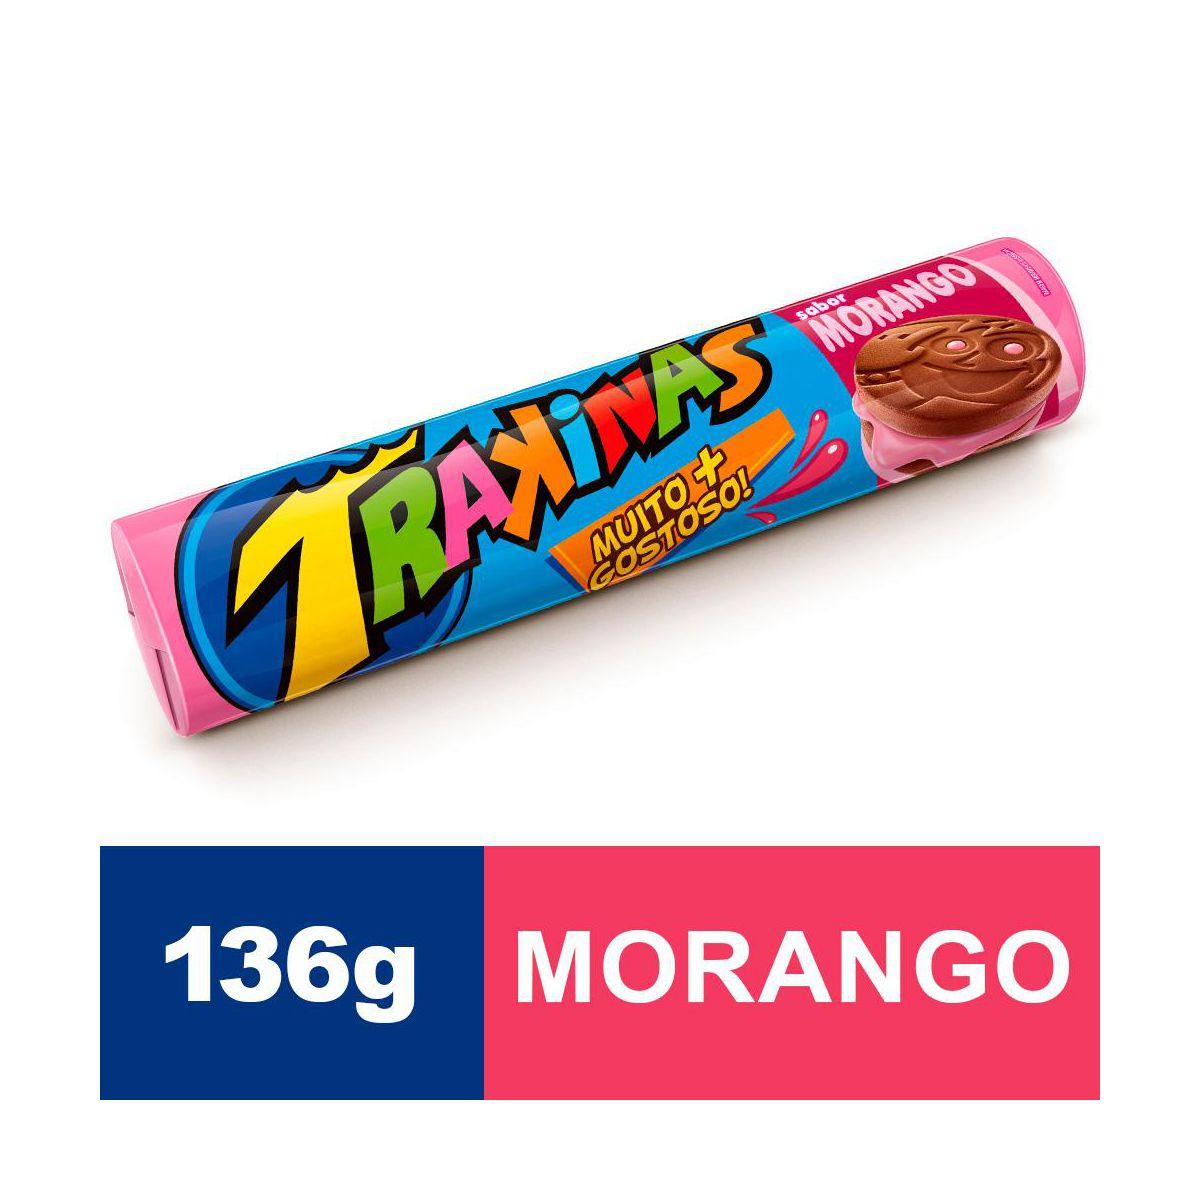 Biscoito recheado sabor morango mais 136g Trakinas pacote PCT